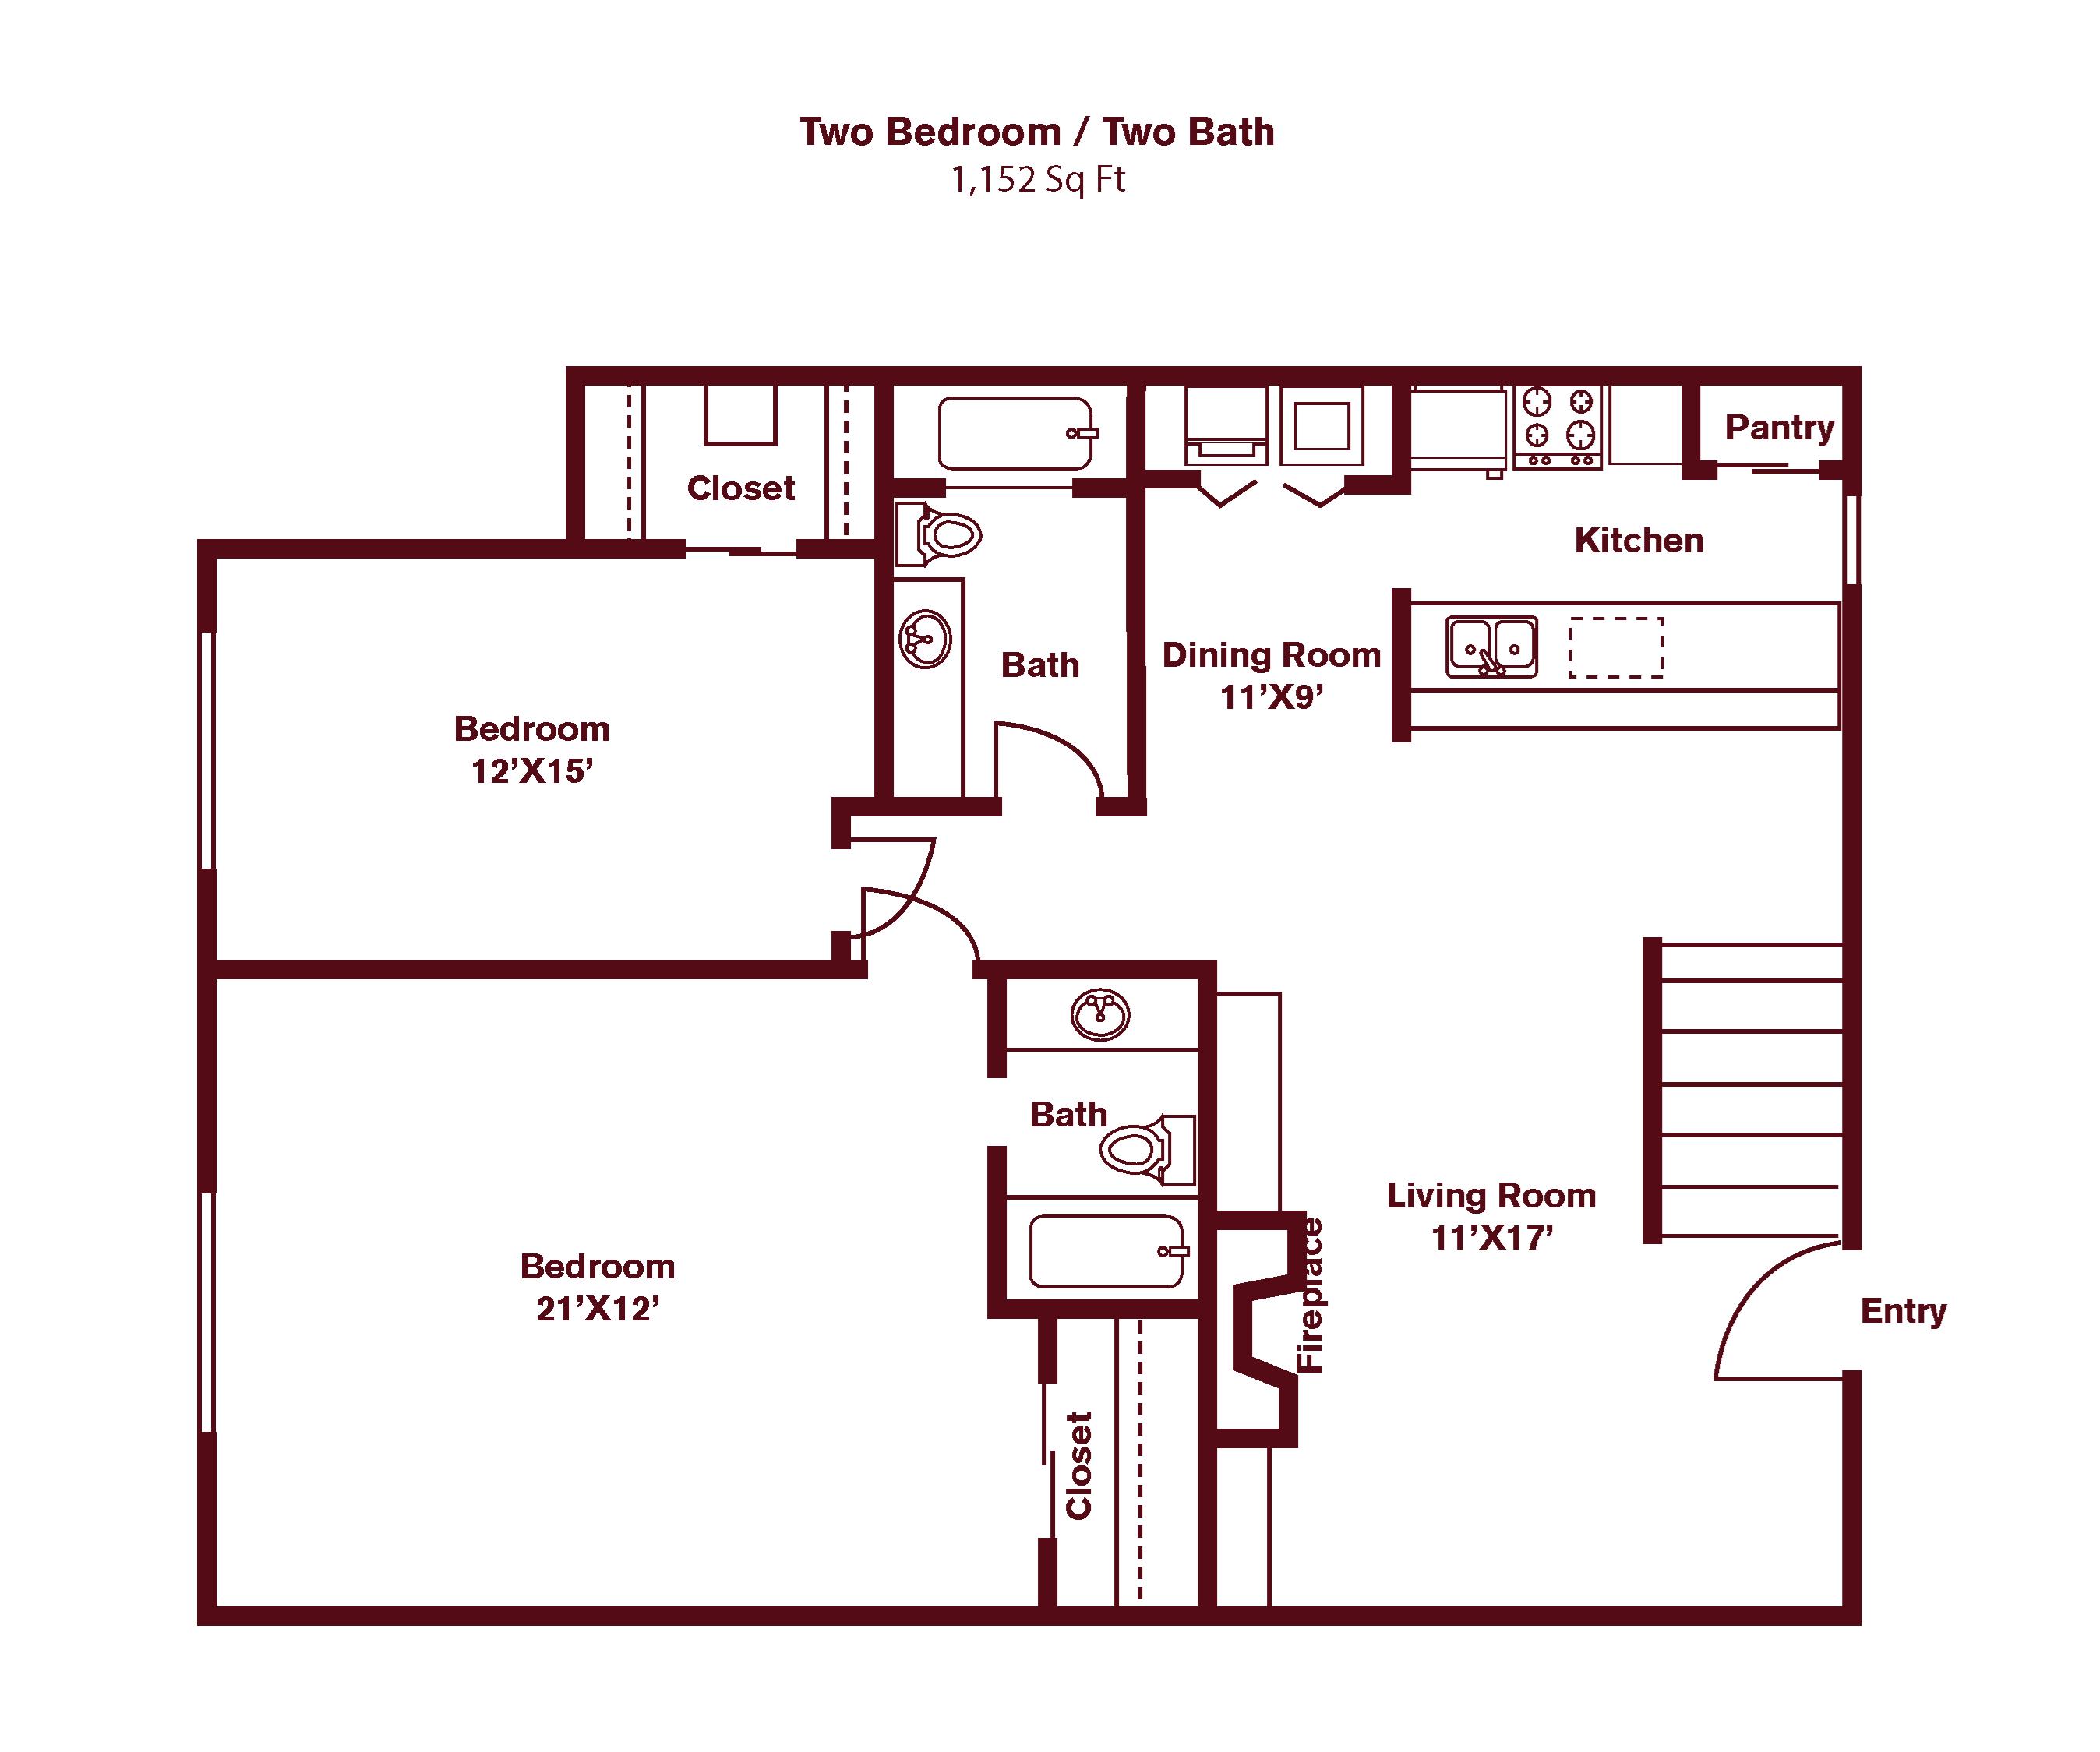 2 Bed/ 2 Bath B9 Floor Plan 20